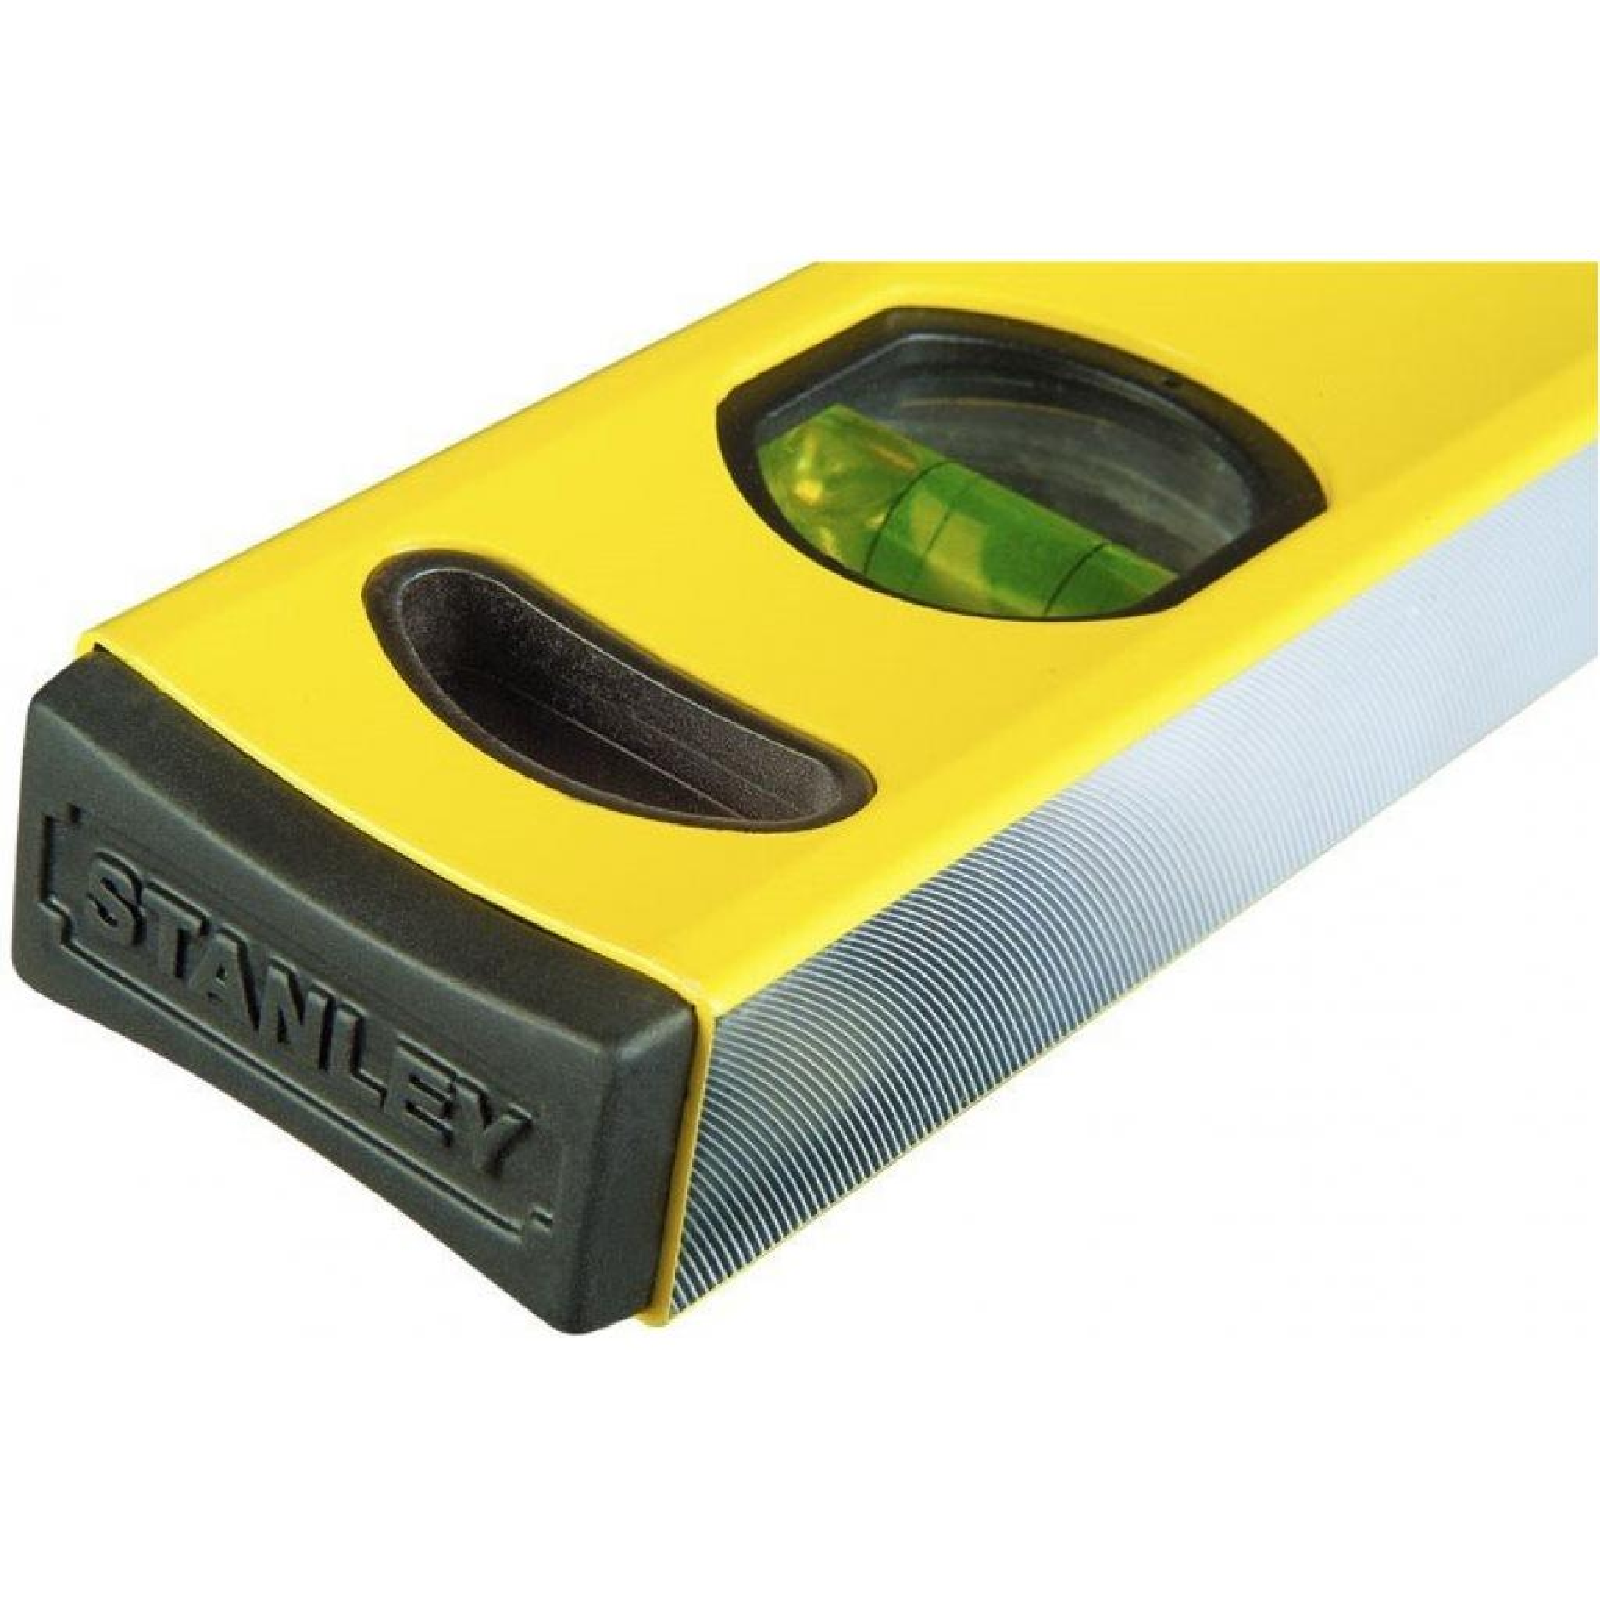 Уровень Stanley Classic Box Level L=400 мм (STHT1-43102) изображение 5